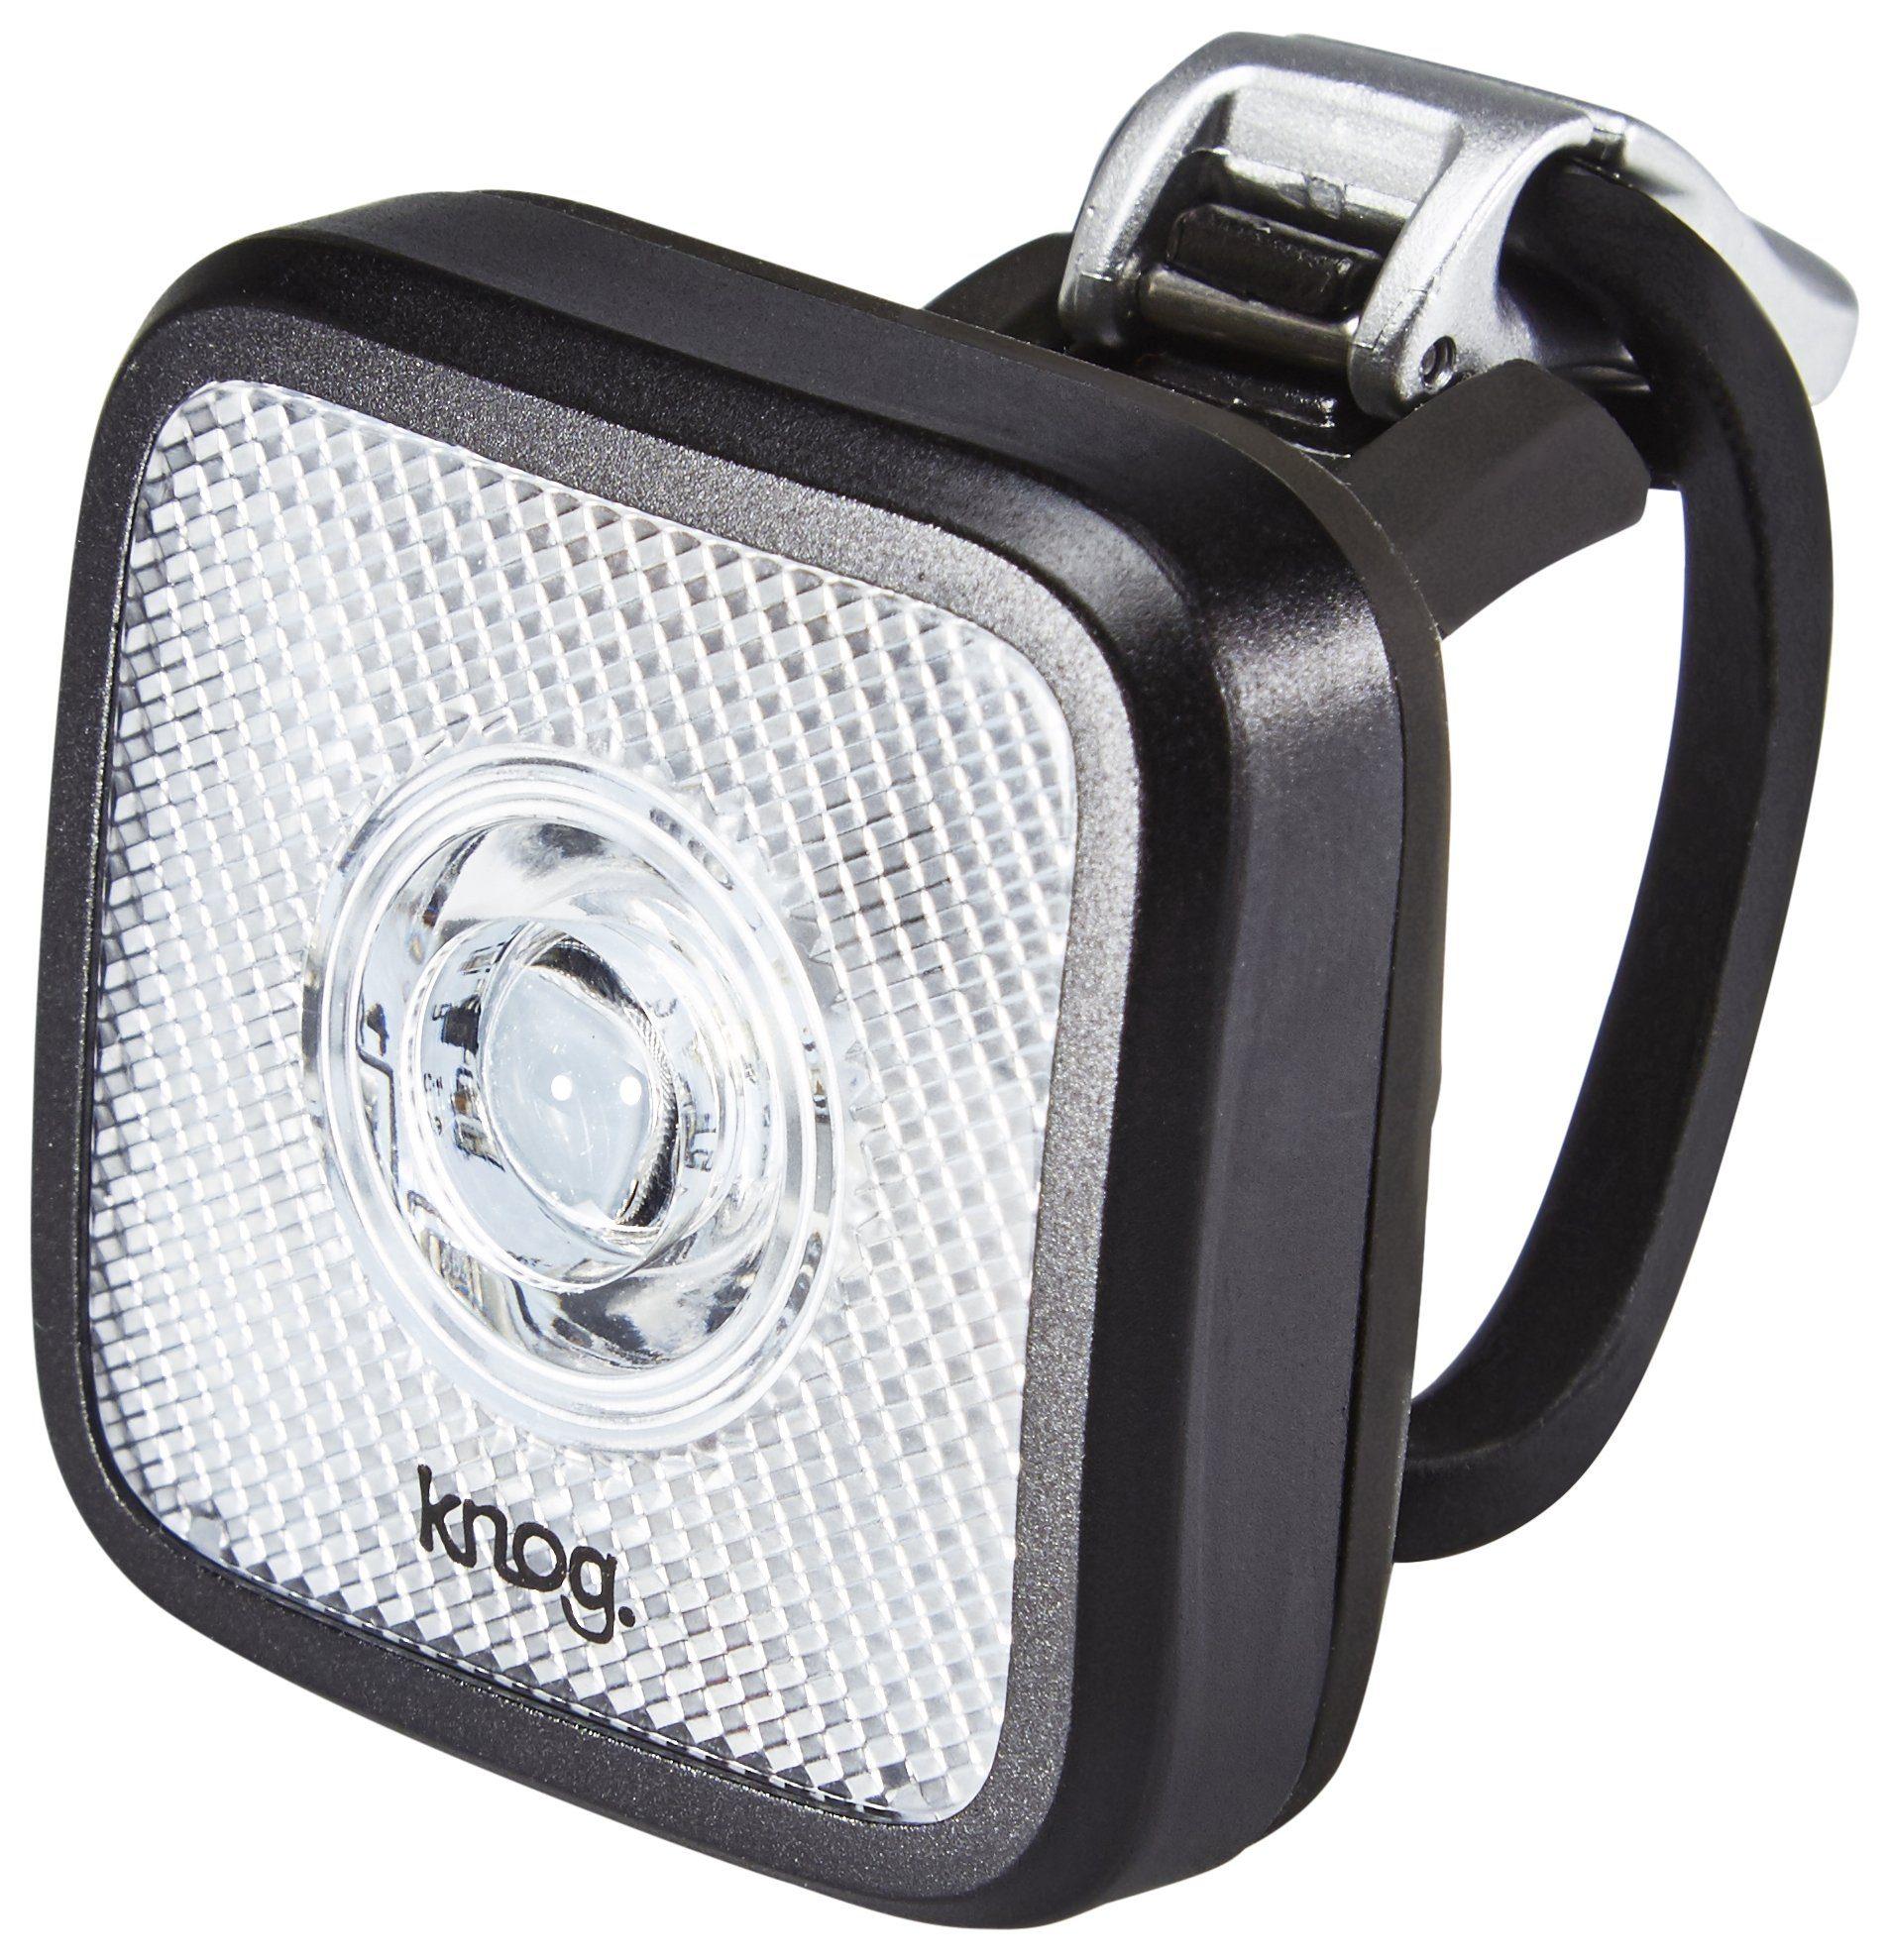 Knog Fahrradbeleuchtung »Blinder MOB Eyeballer Frontlicht weiße LED«